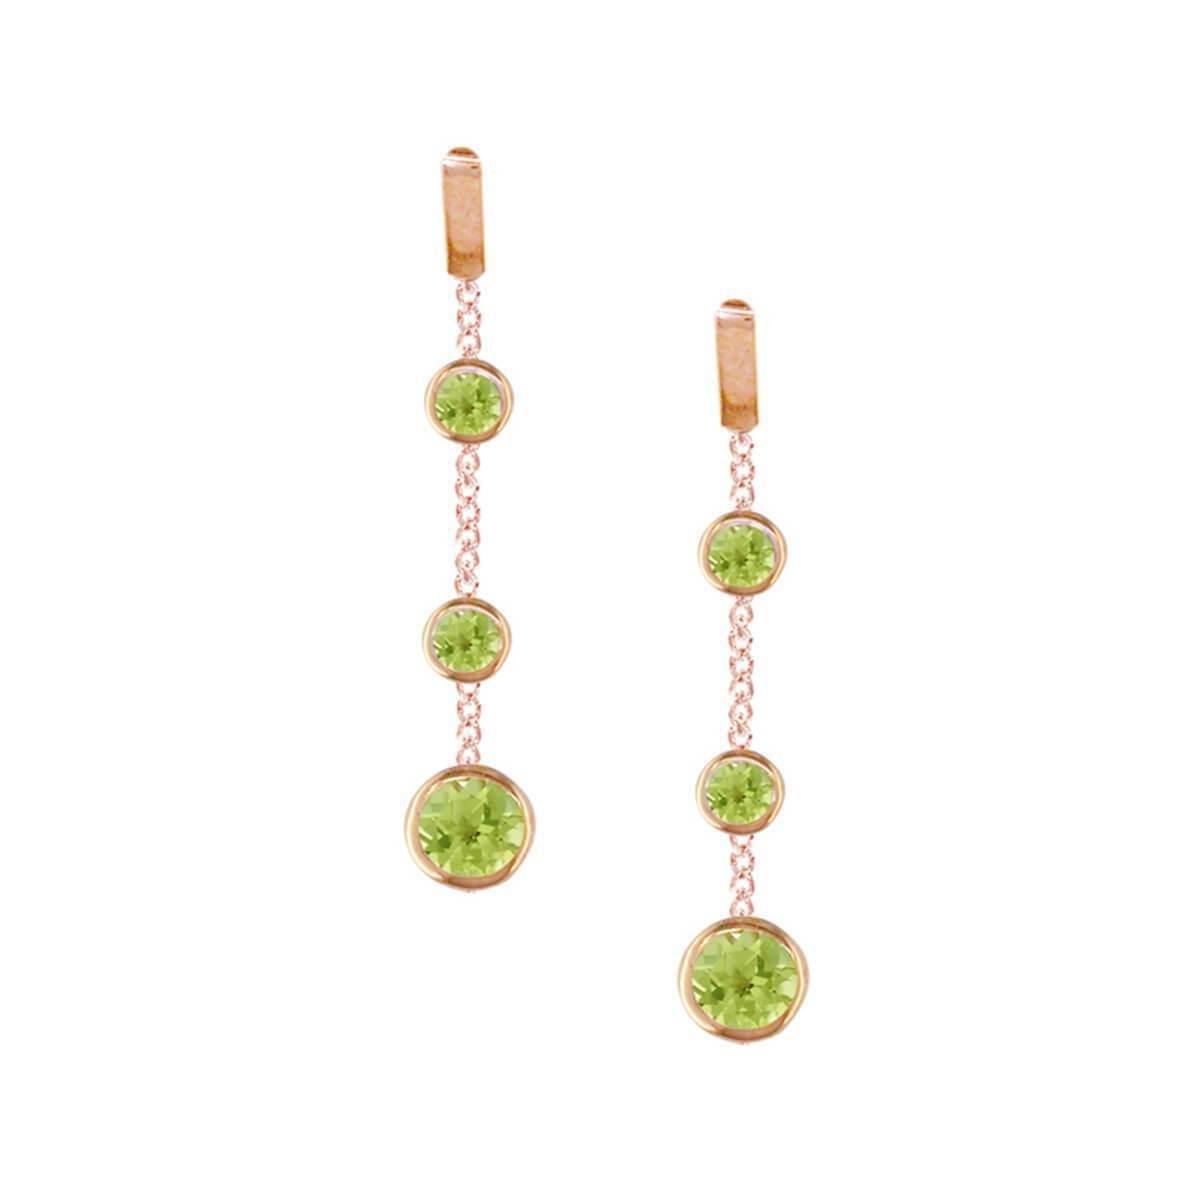 London Road Jewellery Pimlico Rose Gold Peridot Drop Raindrop Earrings aBVDz7LbuZ